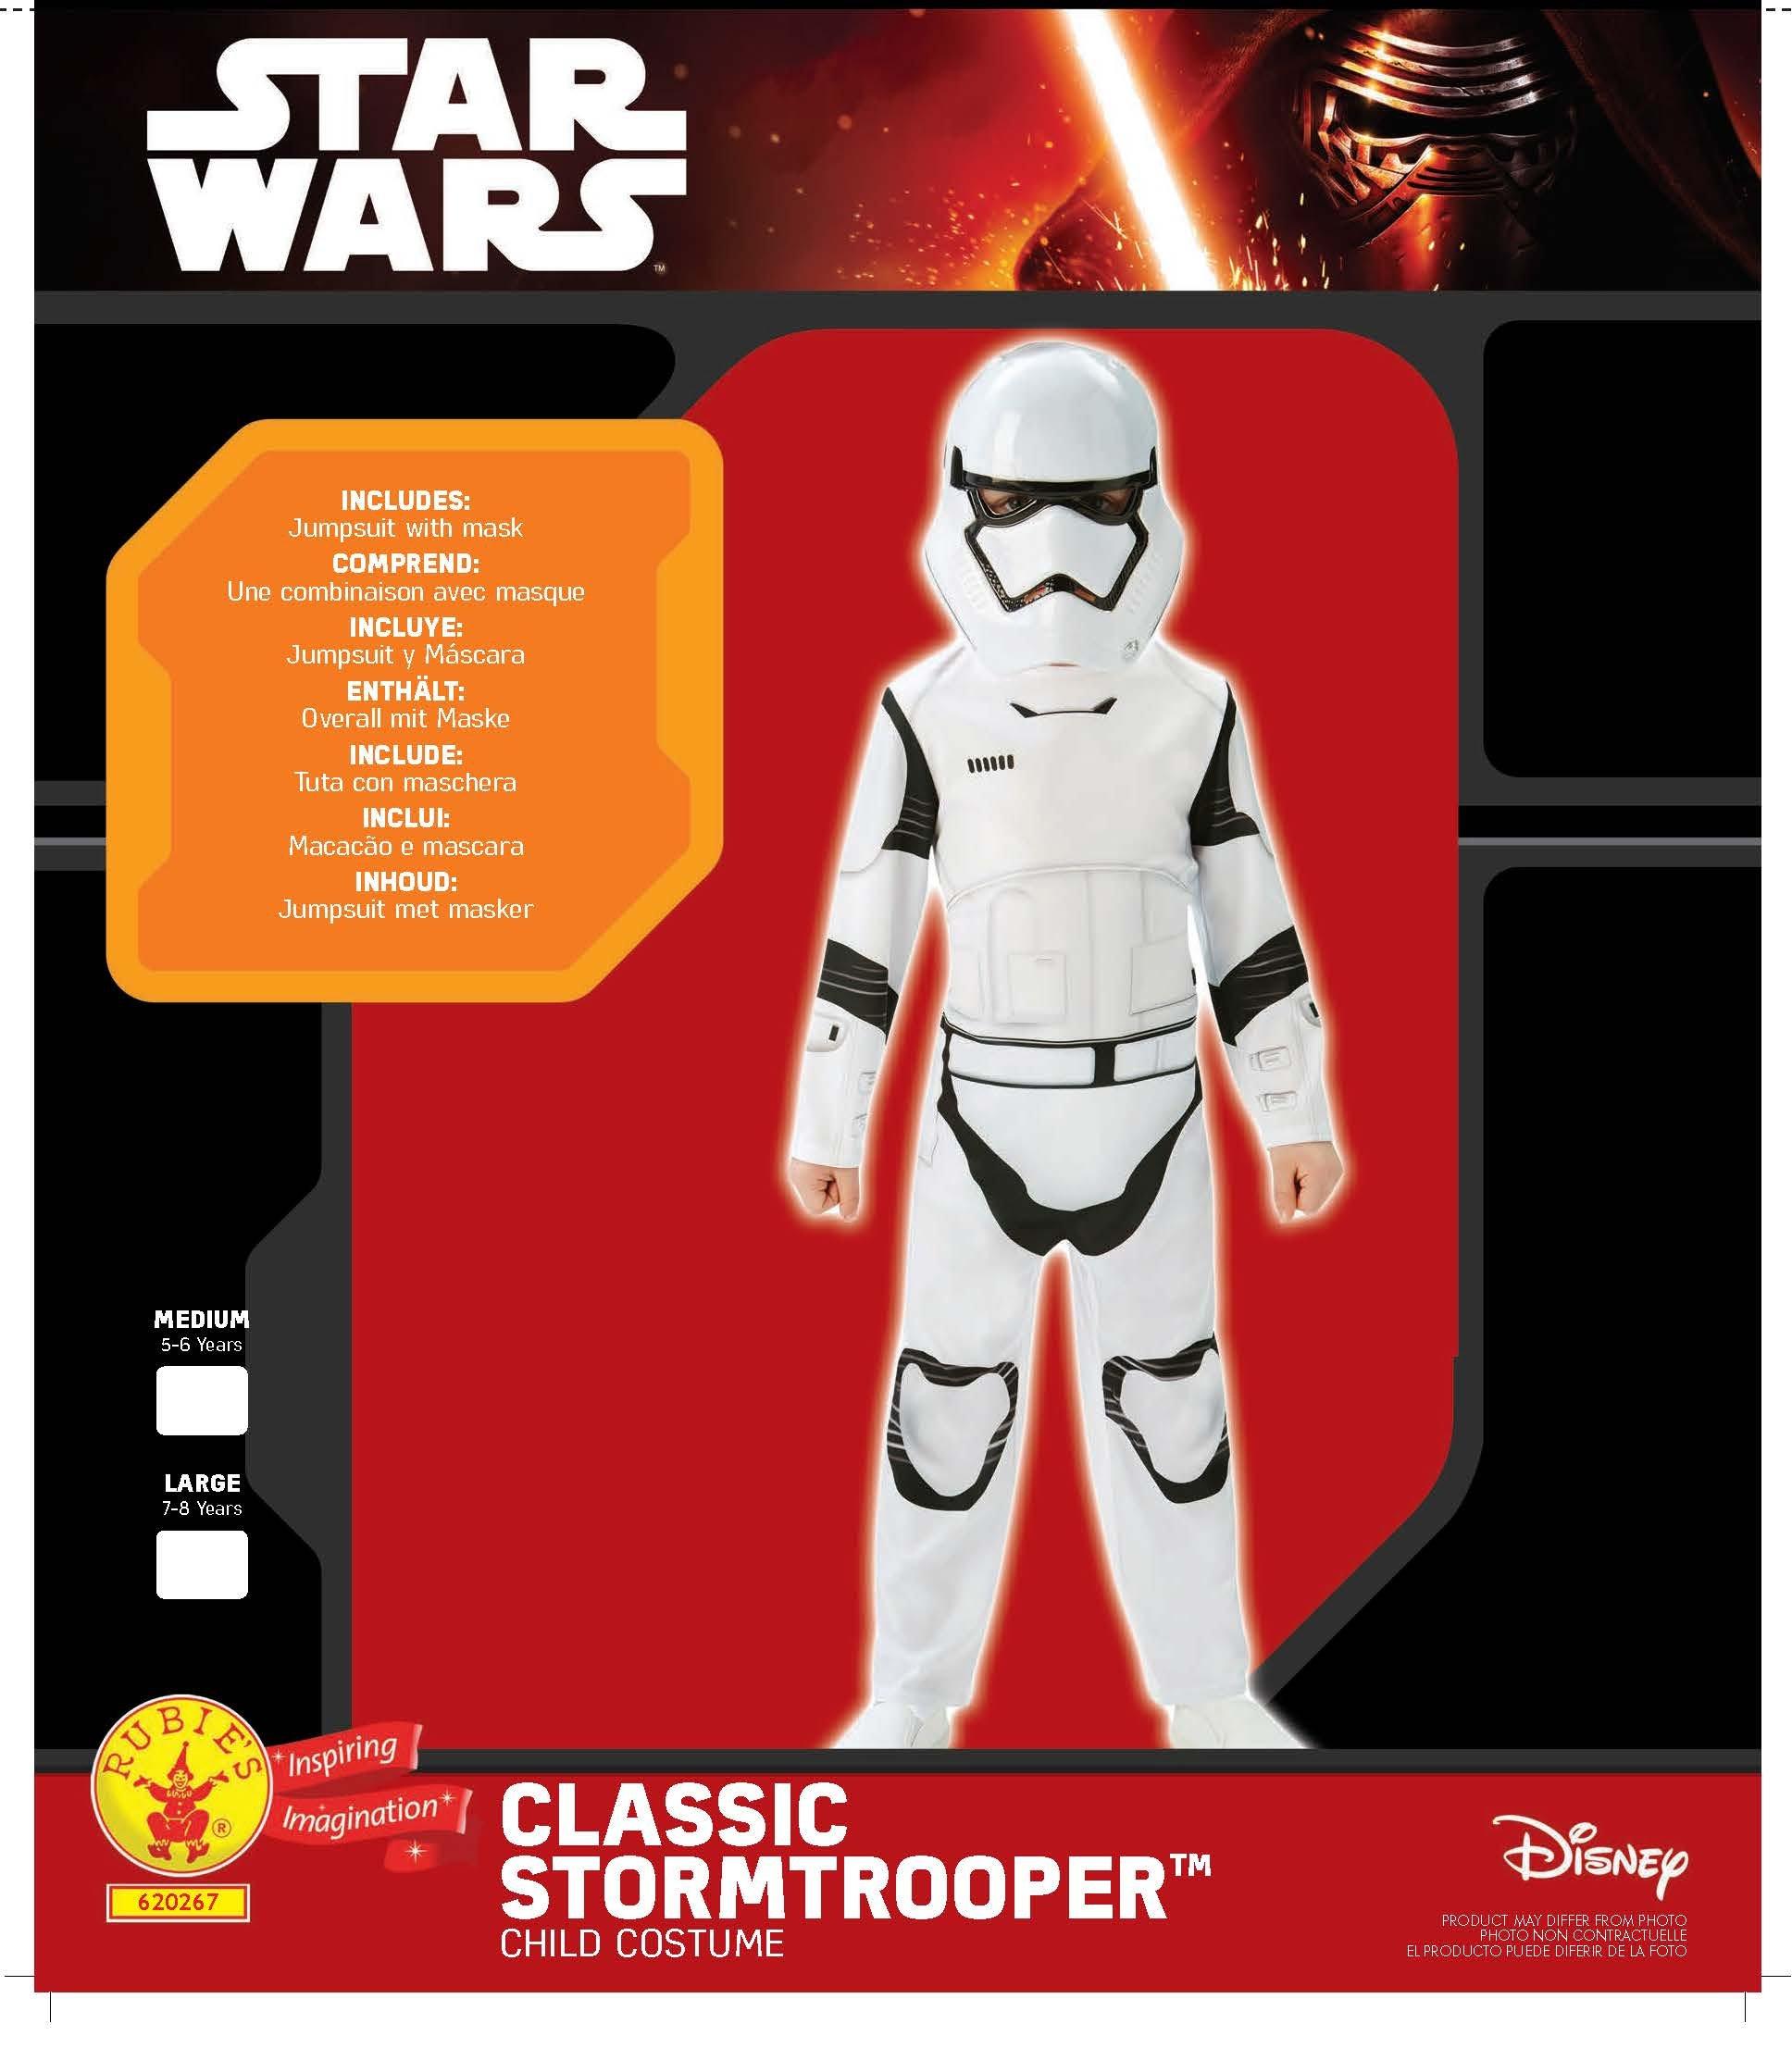 Mezza Maschera Tuta Star Wars Stormtrooper 2 Pezzi per Bambini Bianco Nero 2 spesavip